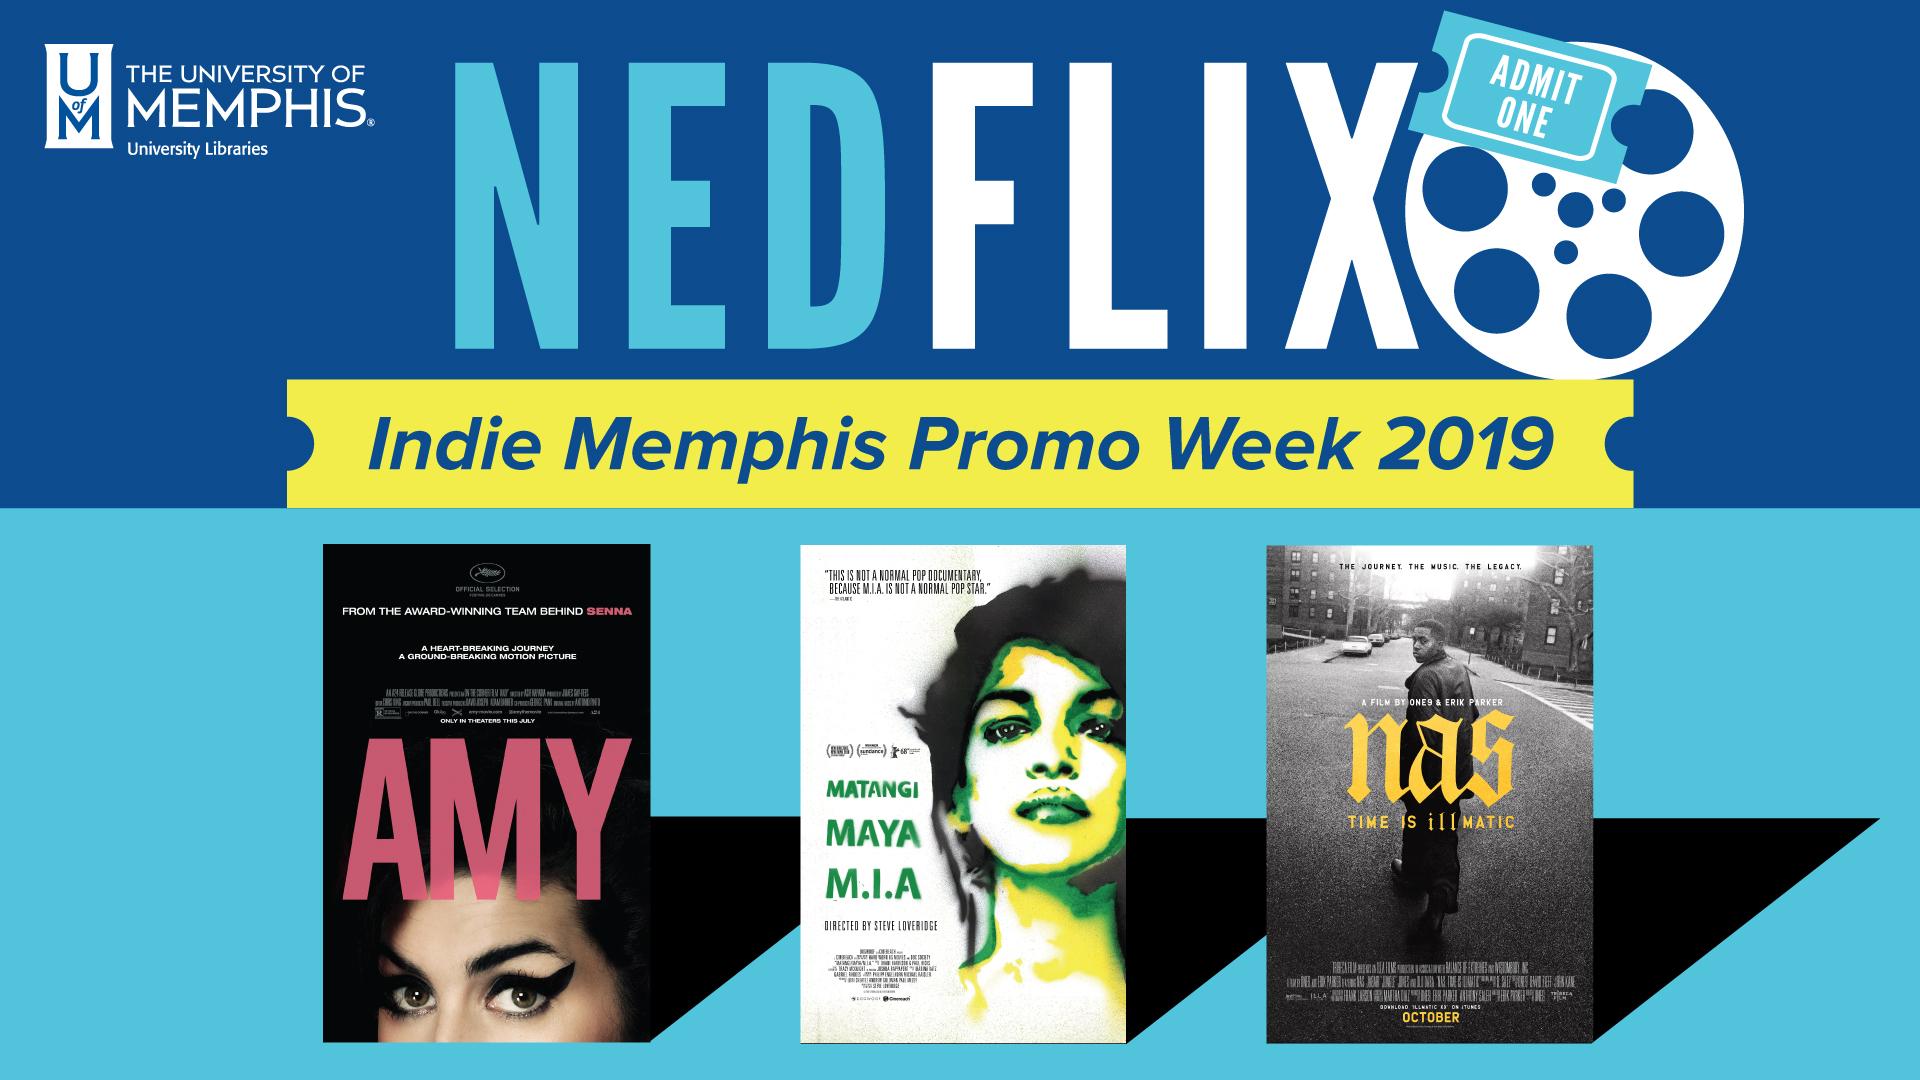 NEDFLIX: Indie Memphis Promo Week